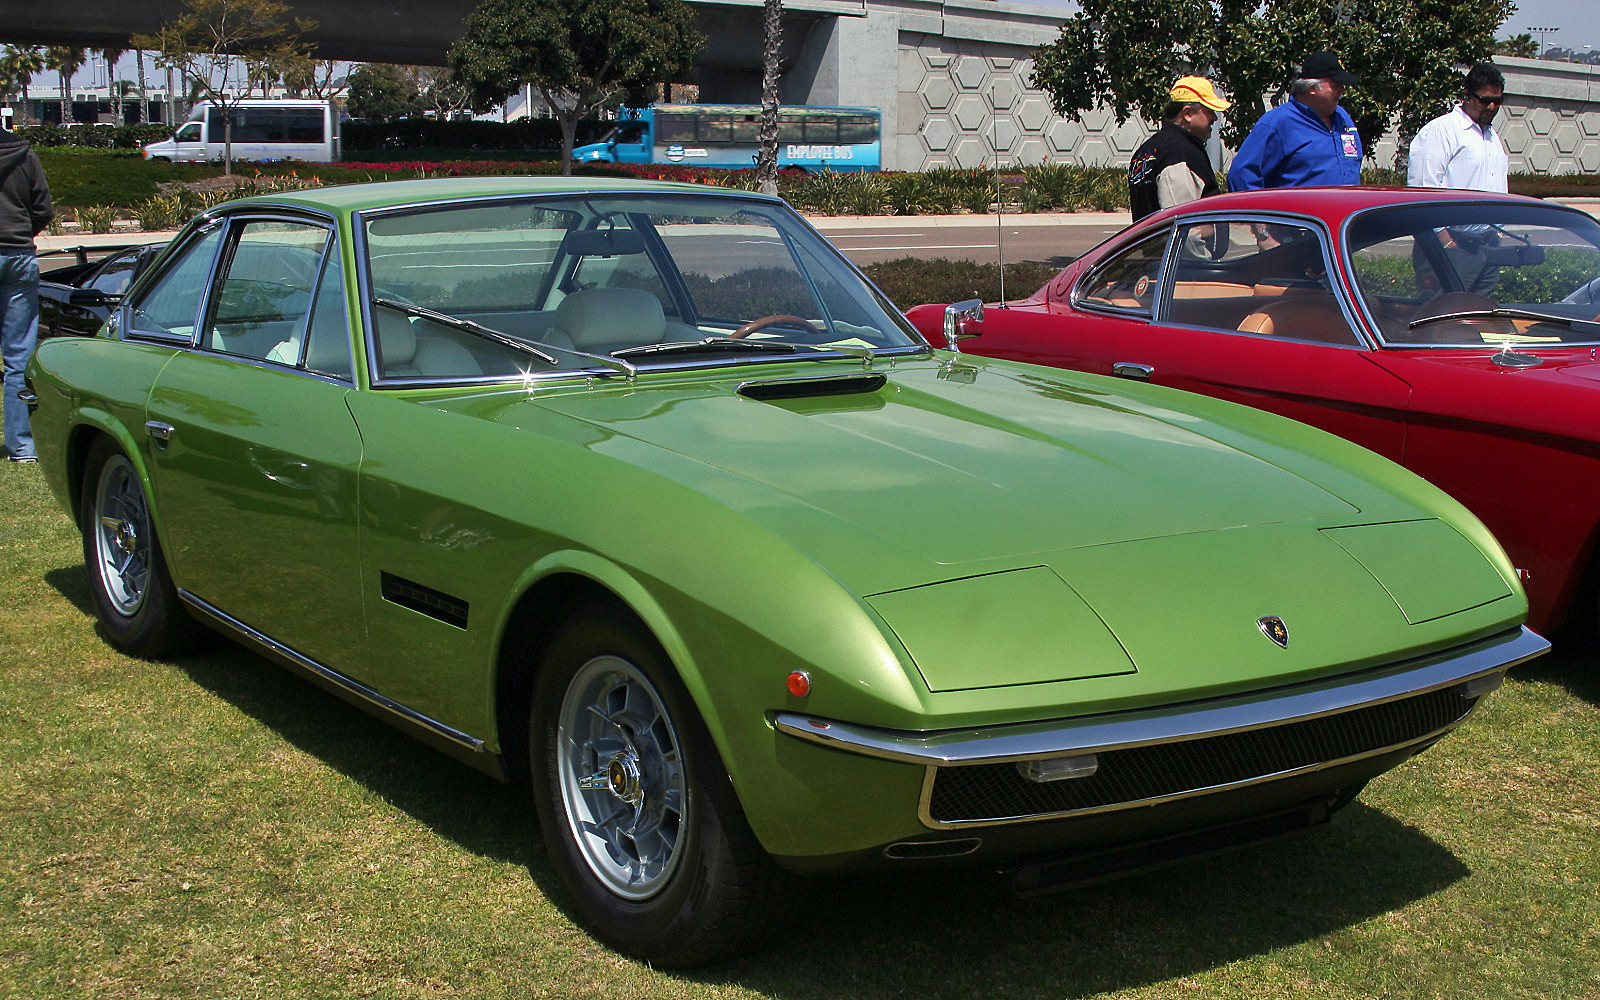 http://upload.wikimedia.org/wikipedia/commons/6/6a/1969_Lamborghini_Islero_S_-_fvr.jpg